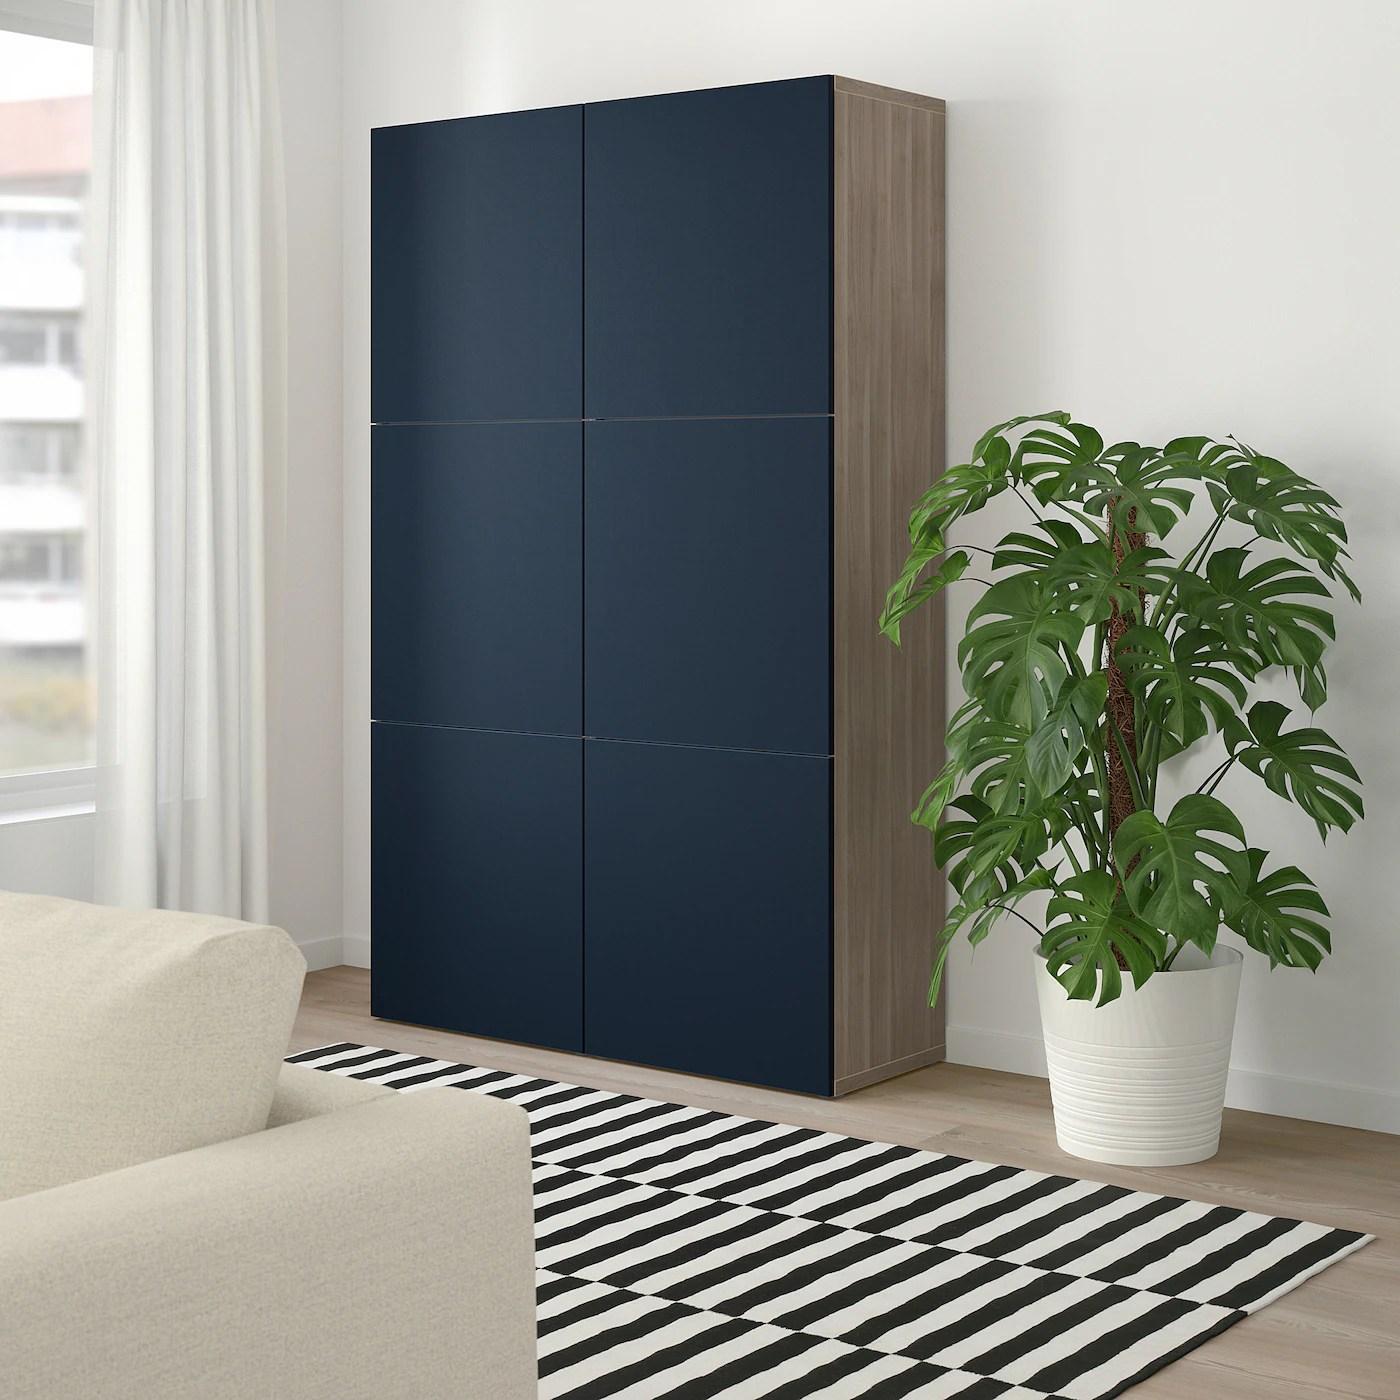 besta rangement a portes effet noyer teinte gris notviken bleu 47 1 4x16 1 2x75 5 8 120x42x192 cm